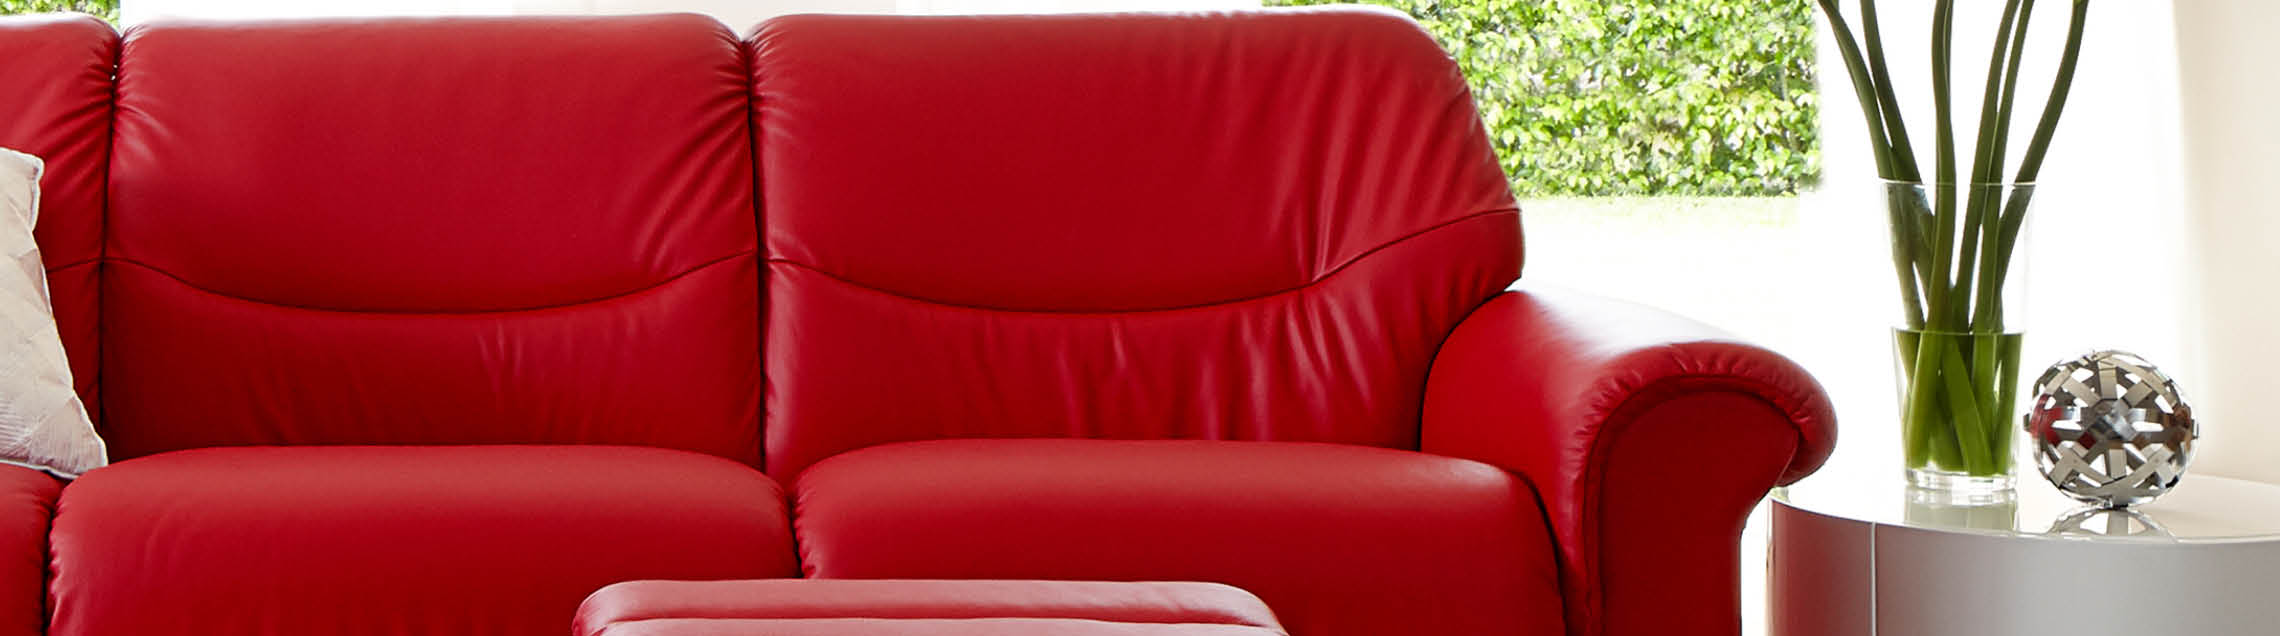 Stressless Eldorado Highback Sofa Modern Recliner Leather Sofa